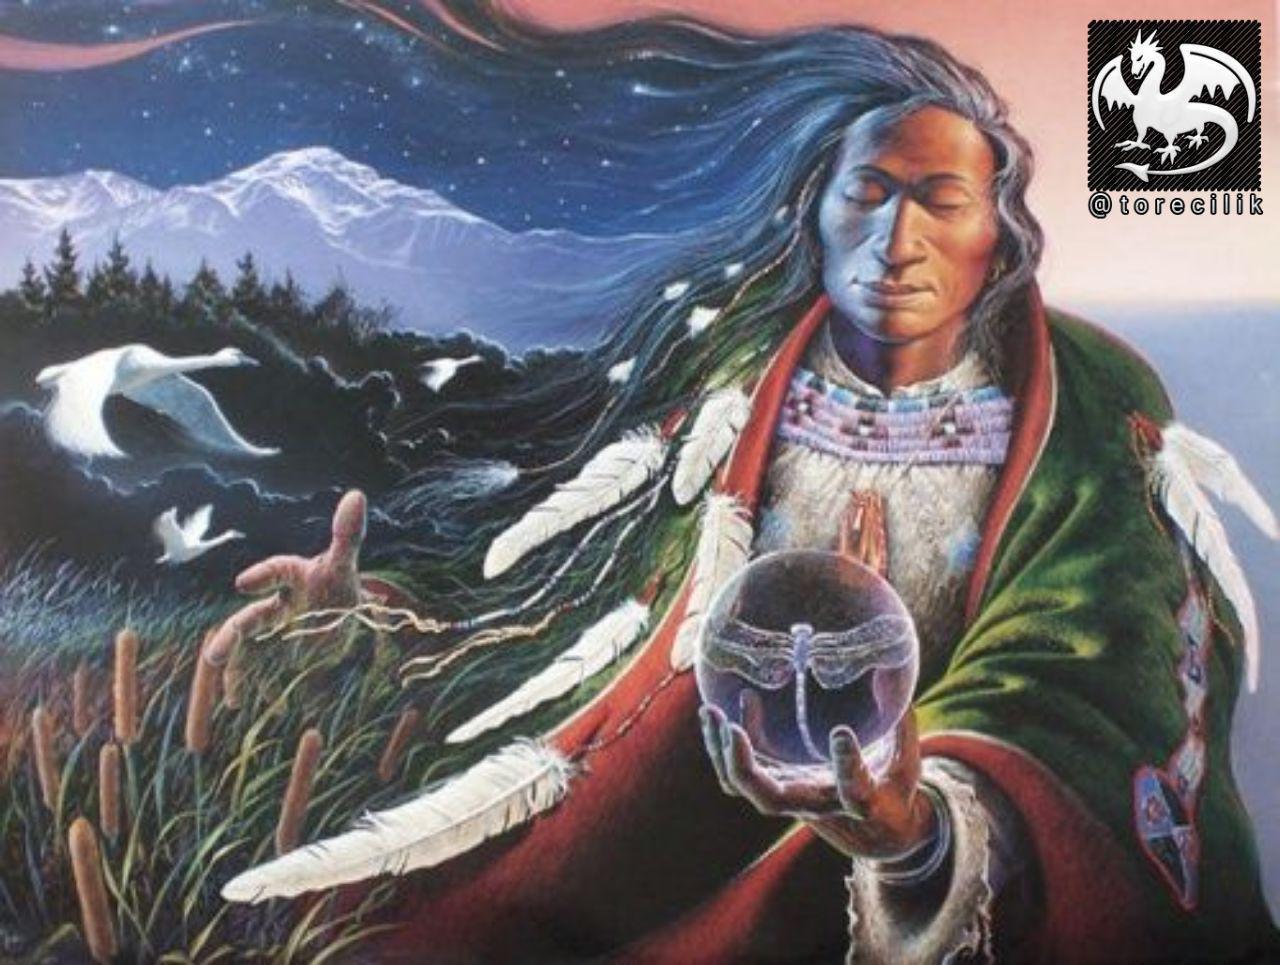 ماهئو: روح اعظم